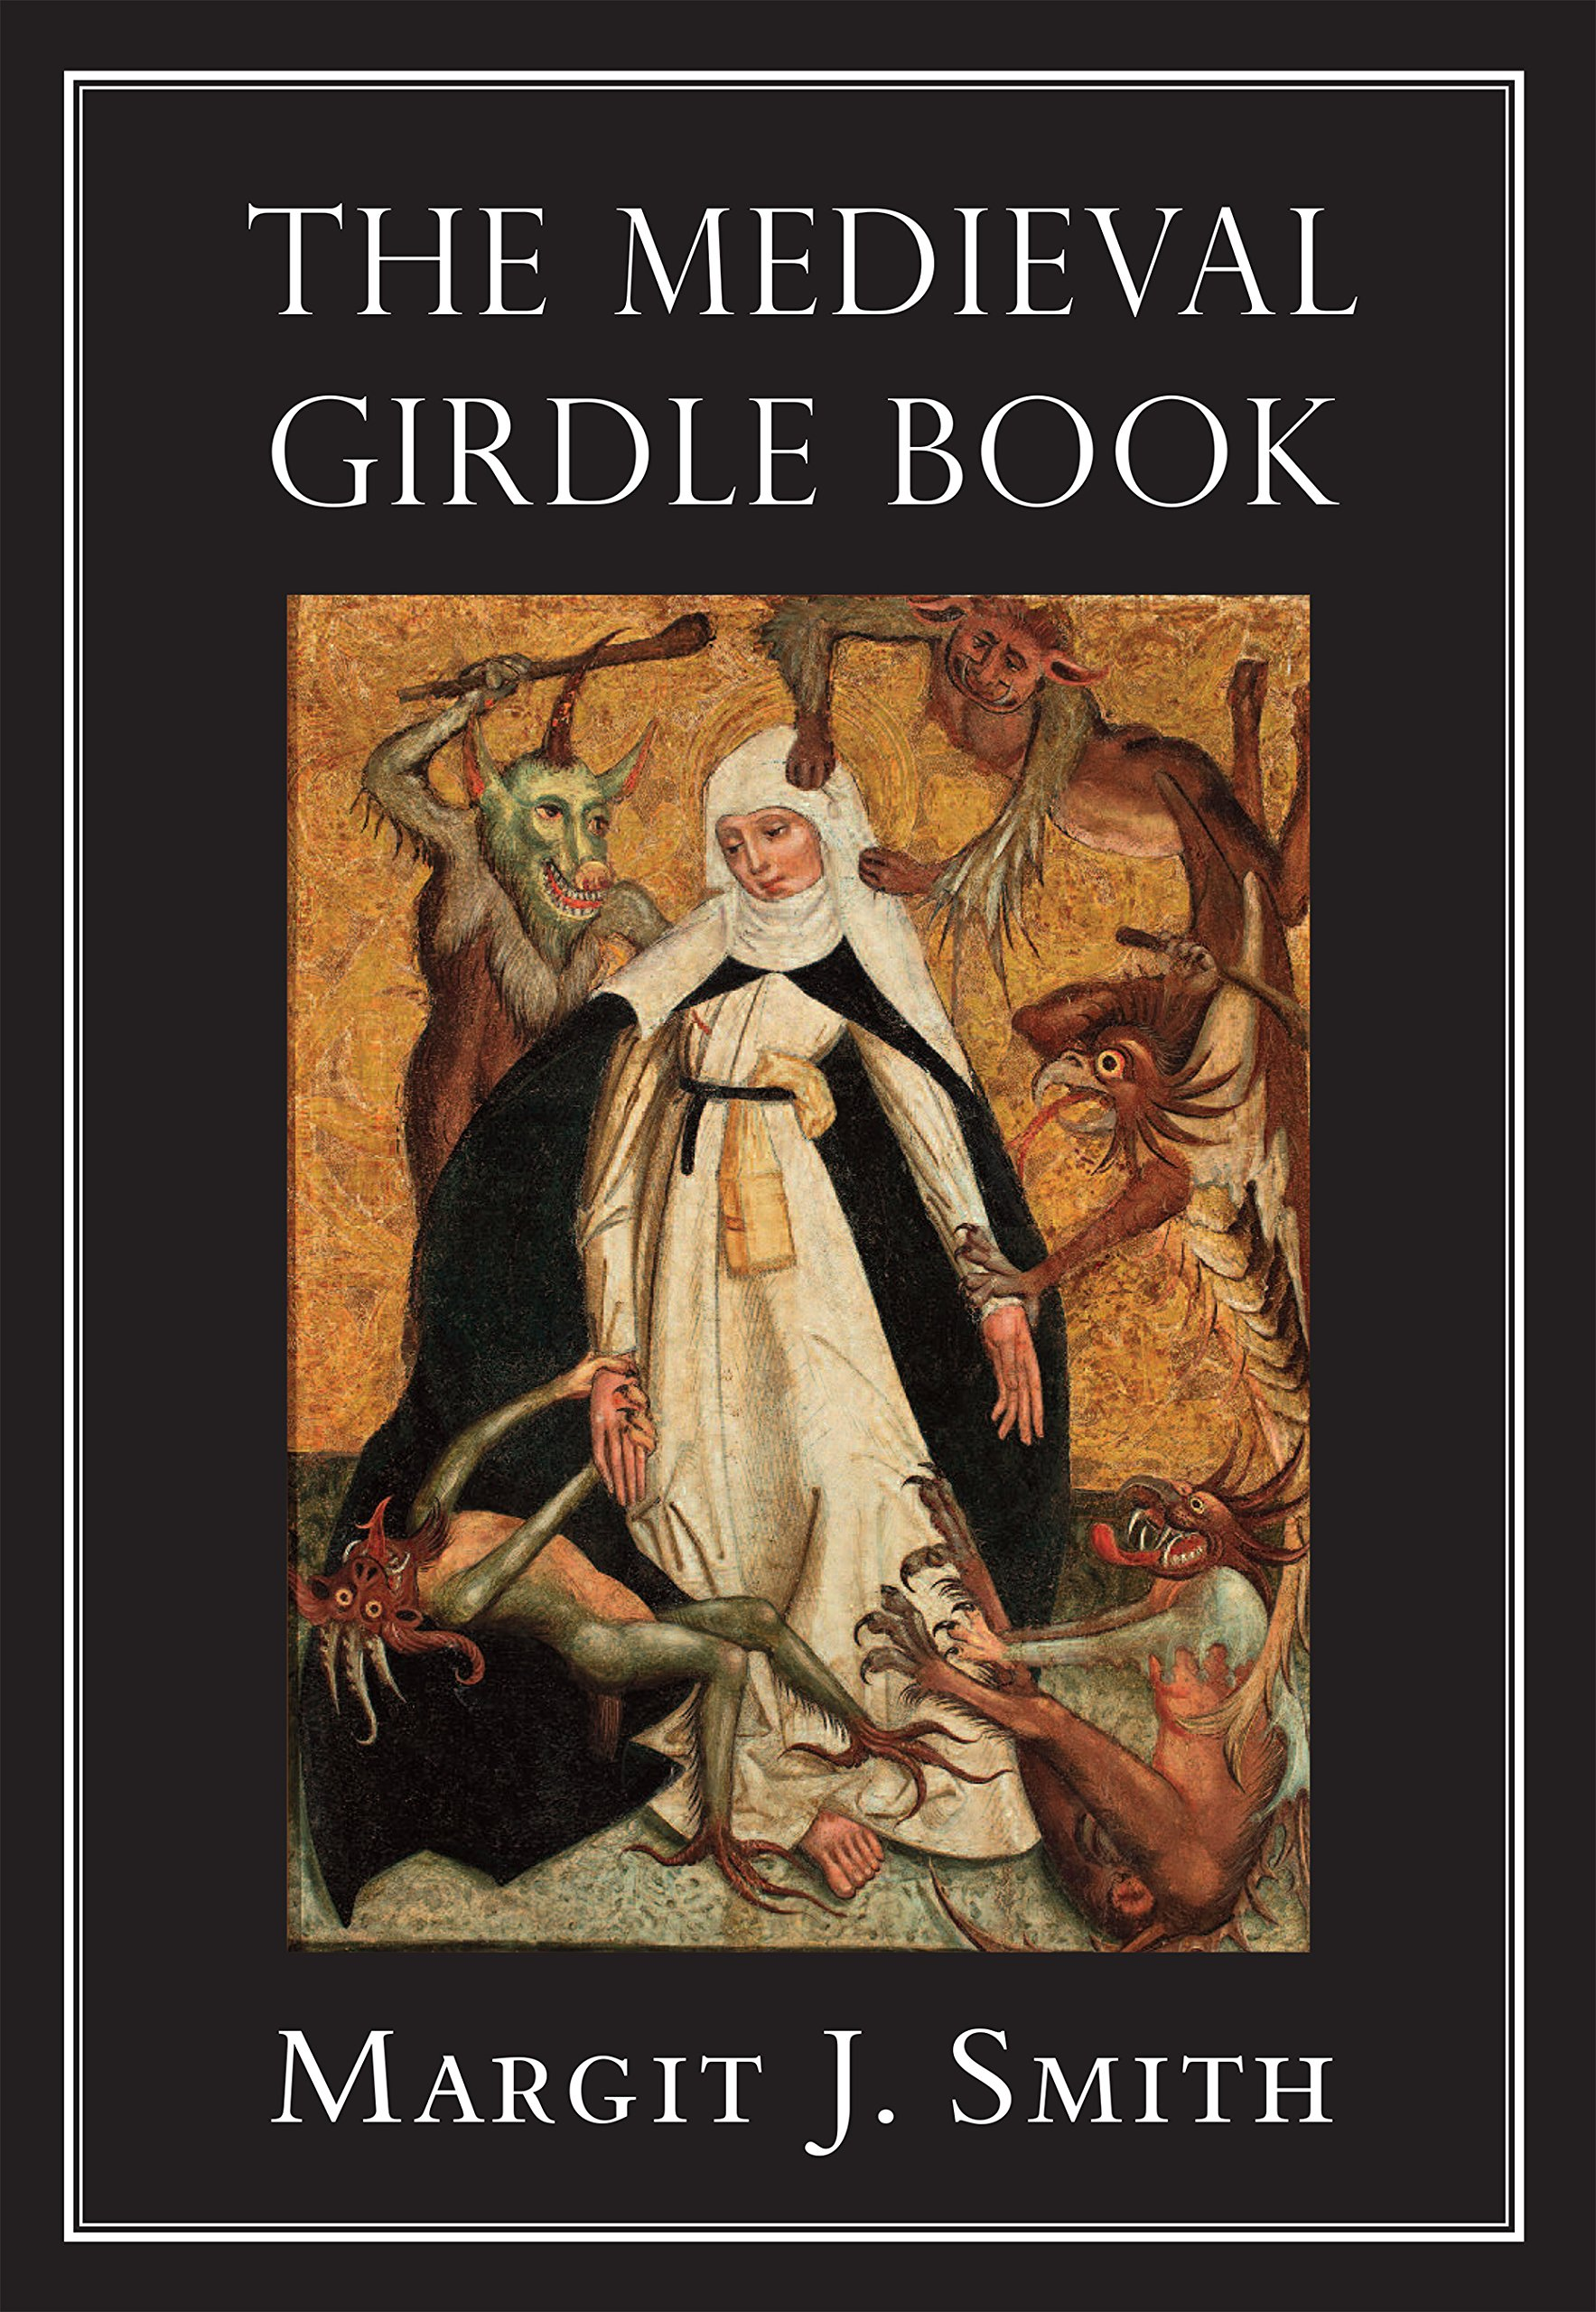 The Medieval Girdle Book